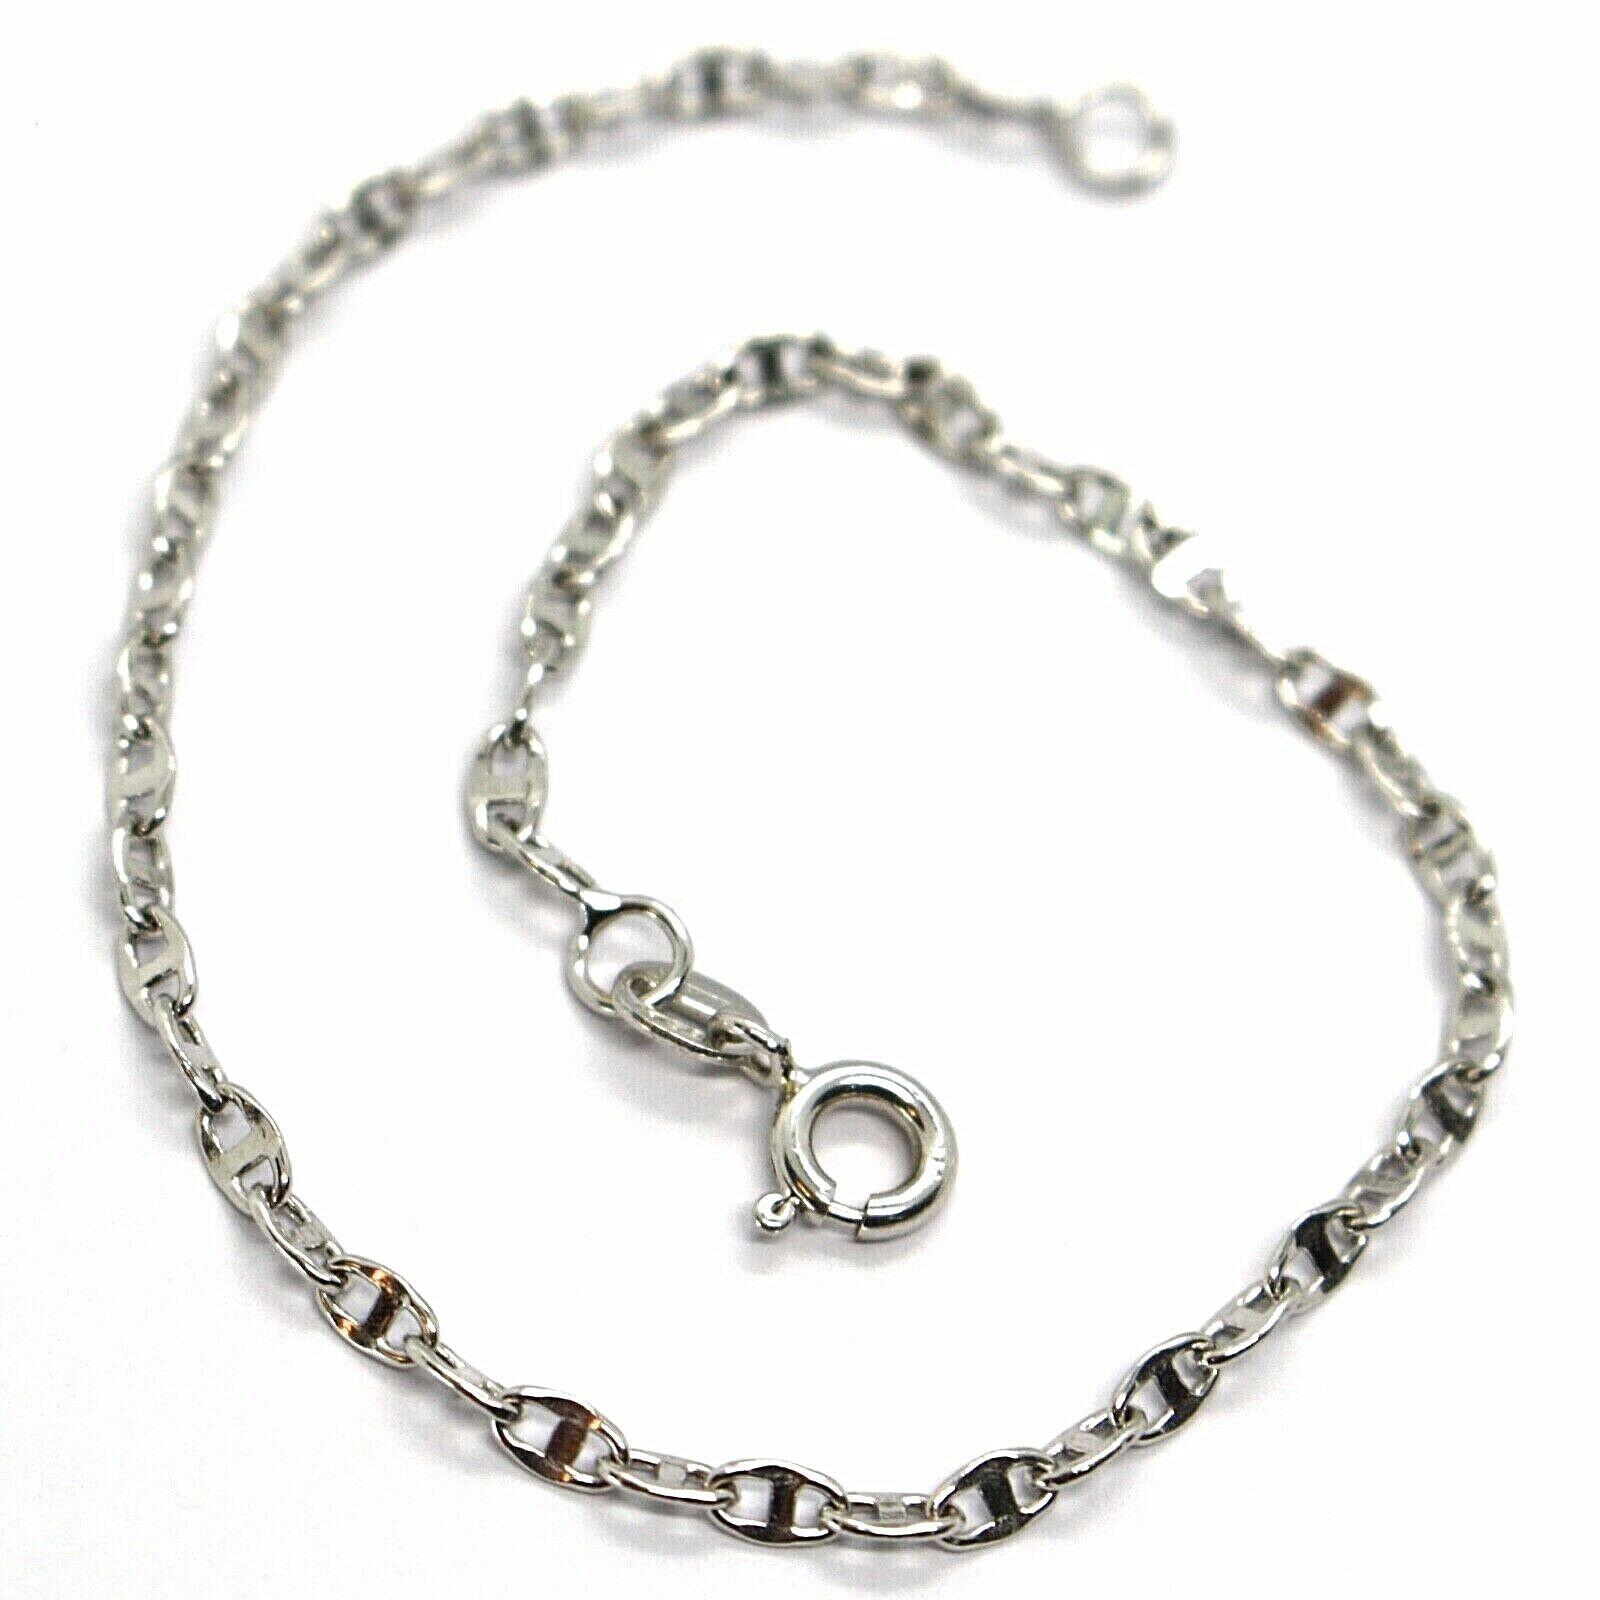 Bracelet White Gold 18K 750, Jersey Marina, Marinara, Crosspiece Criss Crossed image 2